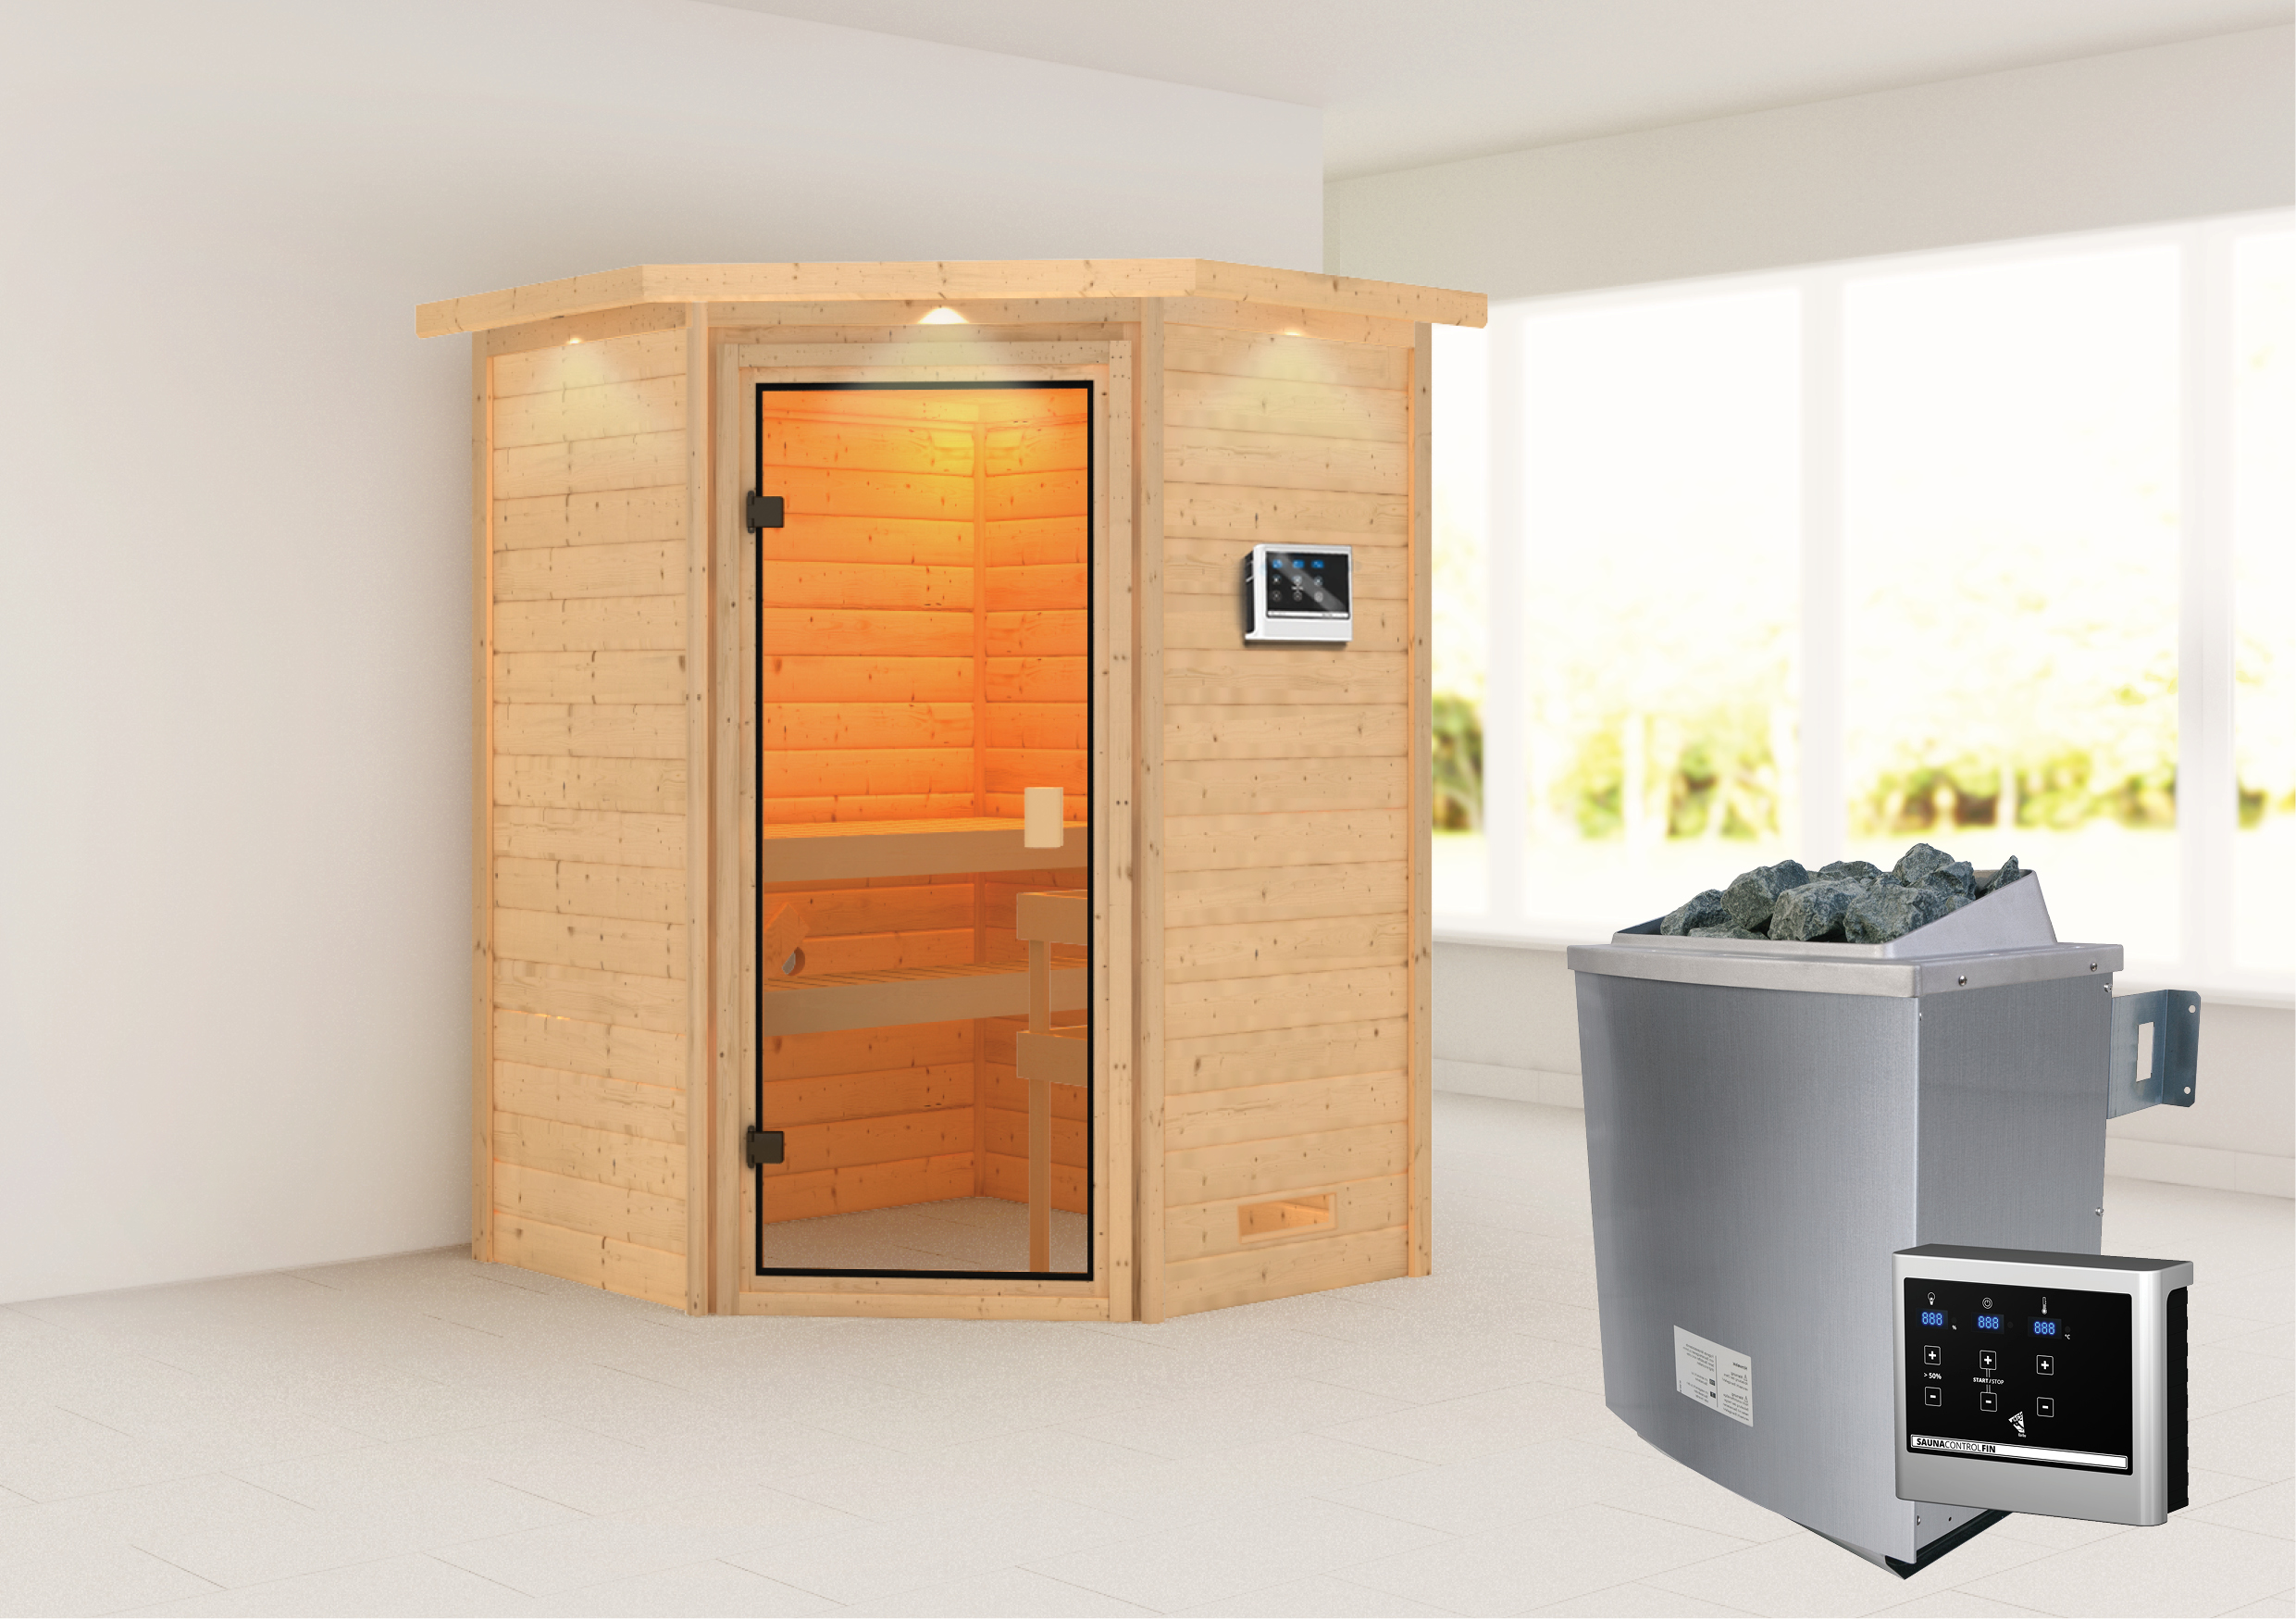 Woodfeeling Sauna Antonia 38mm Dachkranz Saunaofen 9 kW extern Bild 1